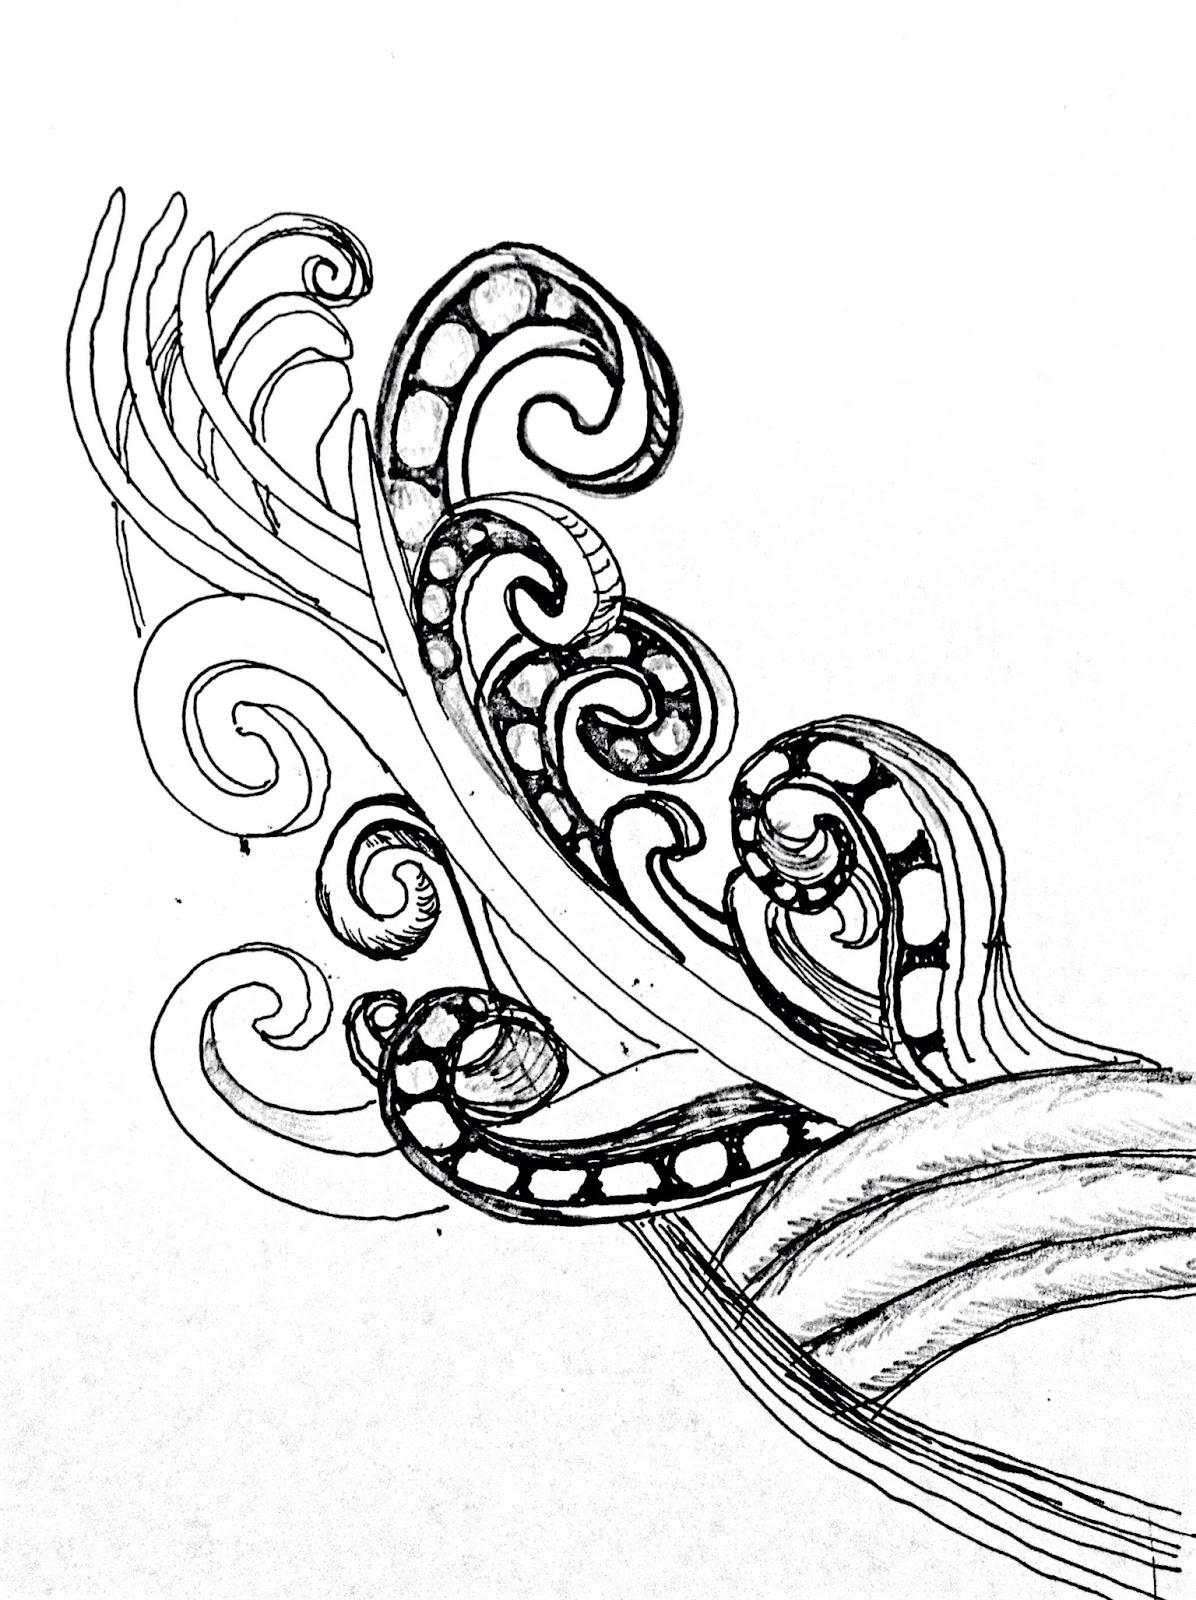 Different Line Designs : The helpful art teacher rhythmic line designs and patterns